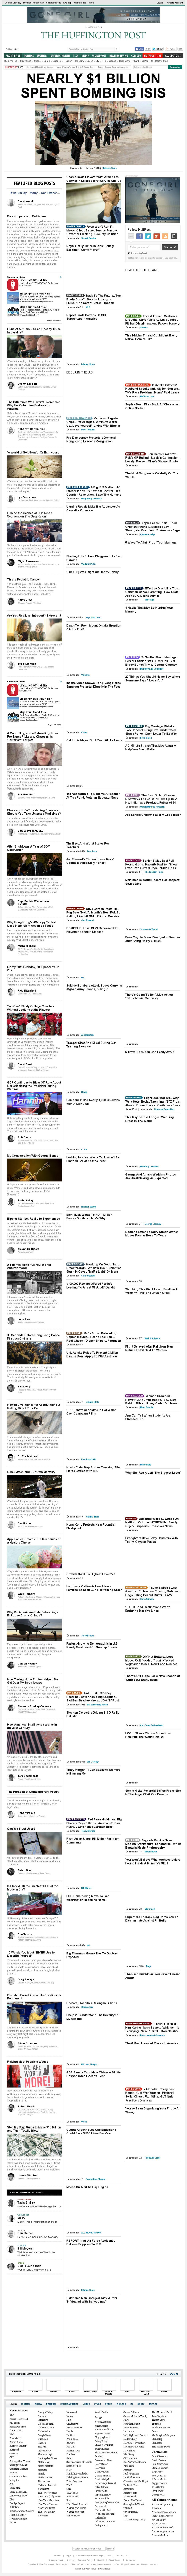 The Huffington Post at Wednesday Oct. 1, 2014, 1:07 p.m. UTC